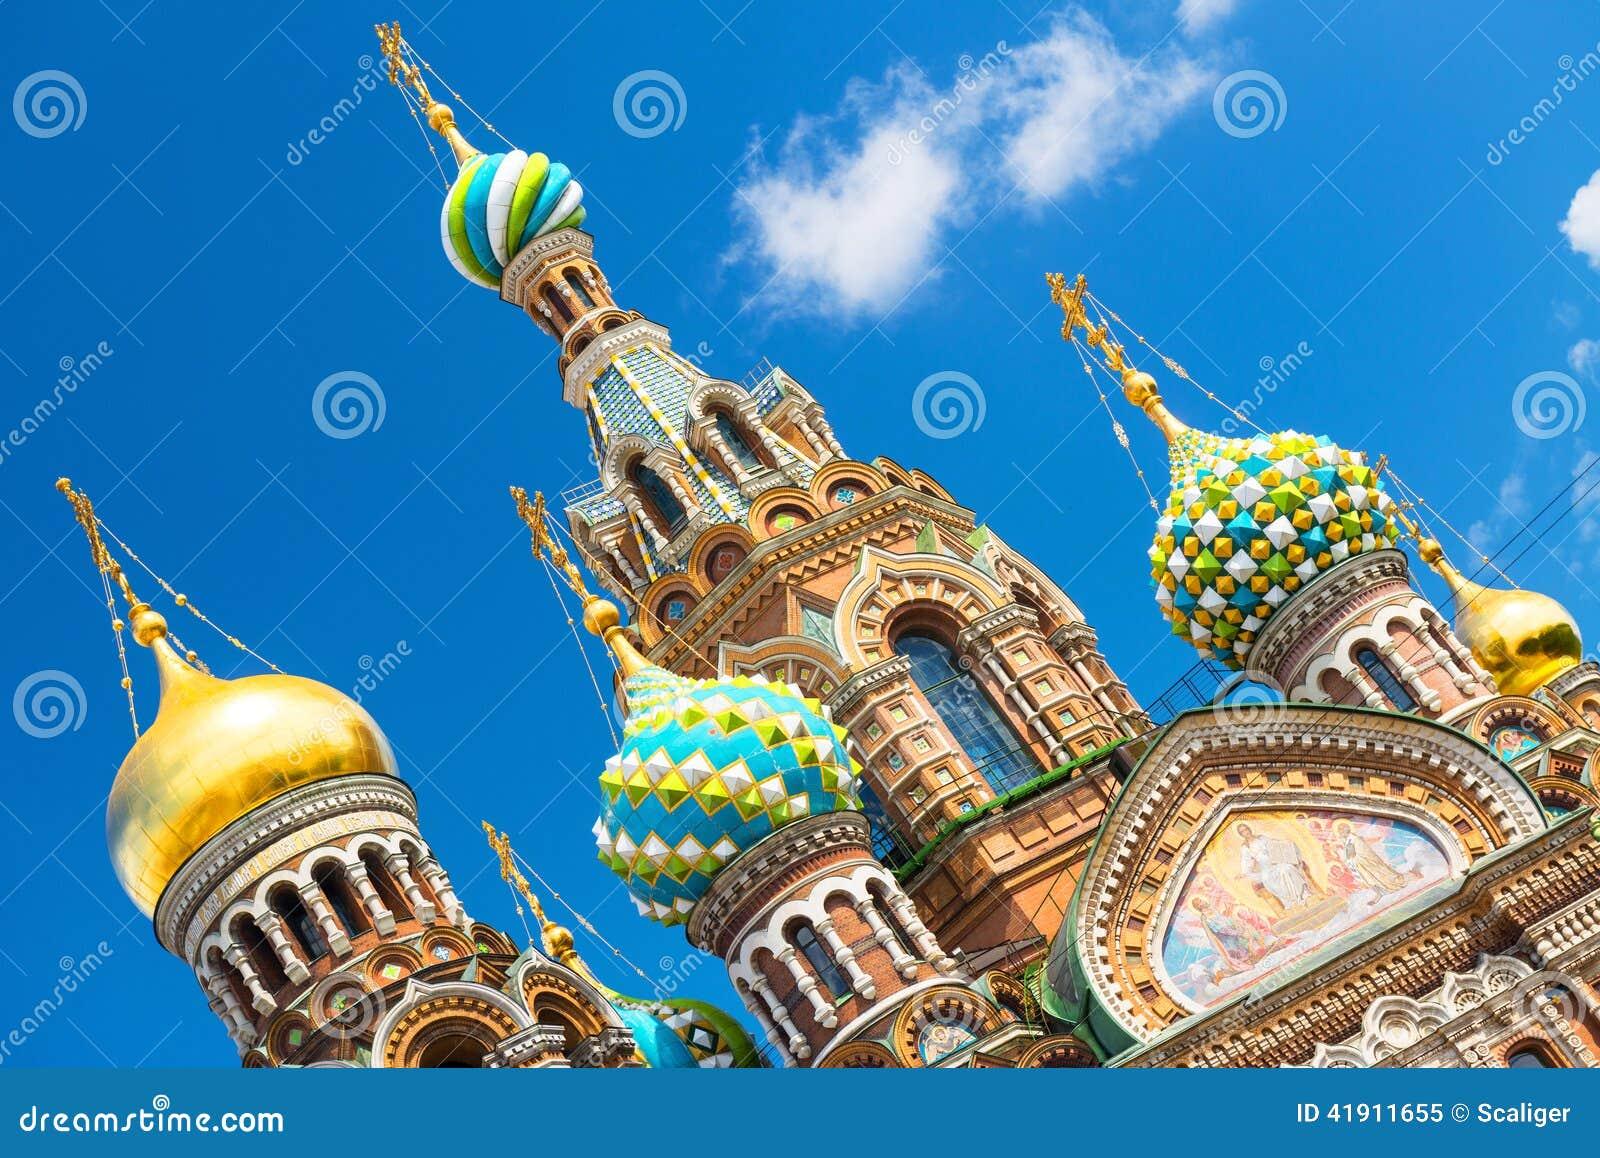 Iglesia del salvador en sangre derramada en St Petersburg, Rusia